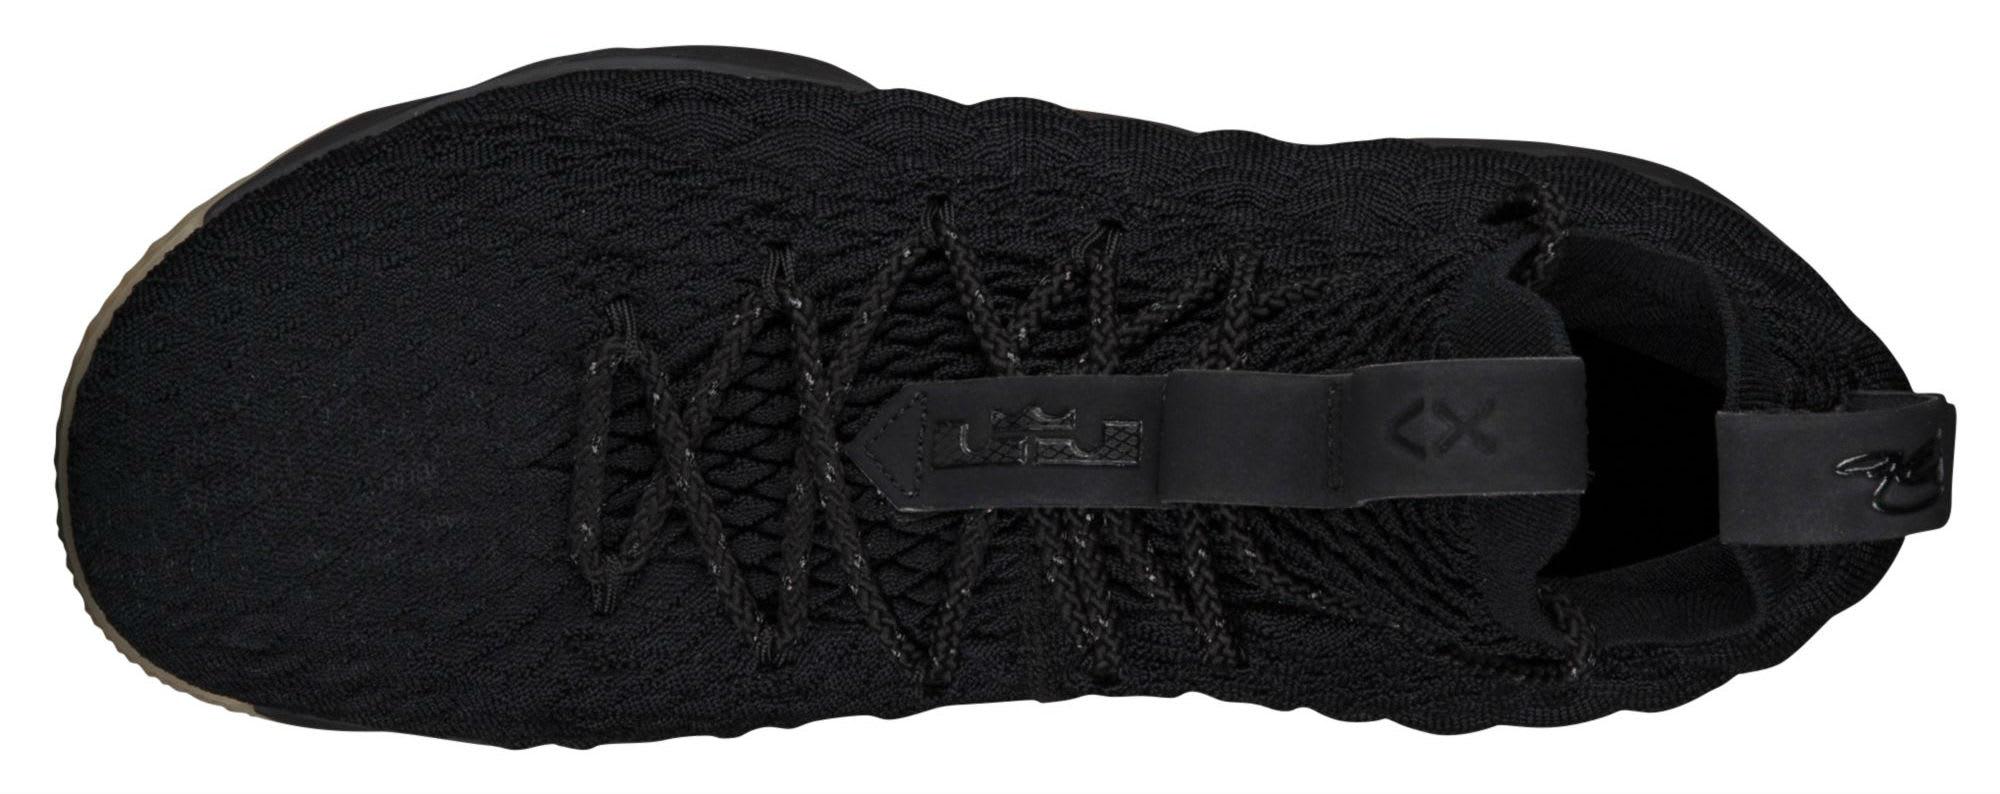 017853f4c4b0 ... Nike LeBron 15 Black Gum Release Date 897648-300 Top ...